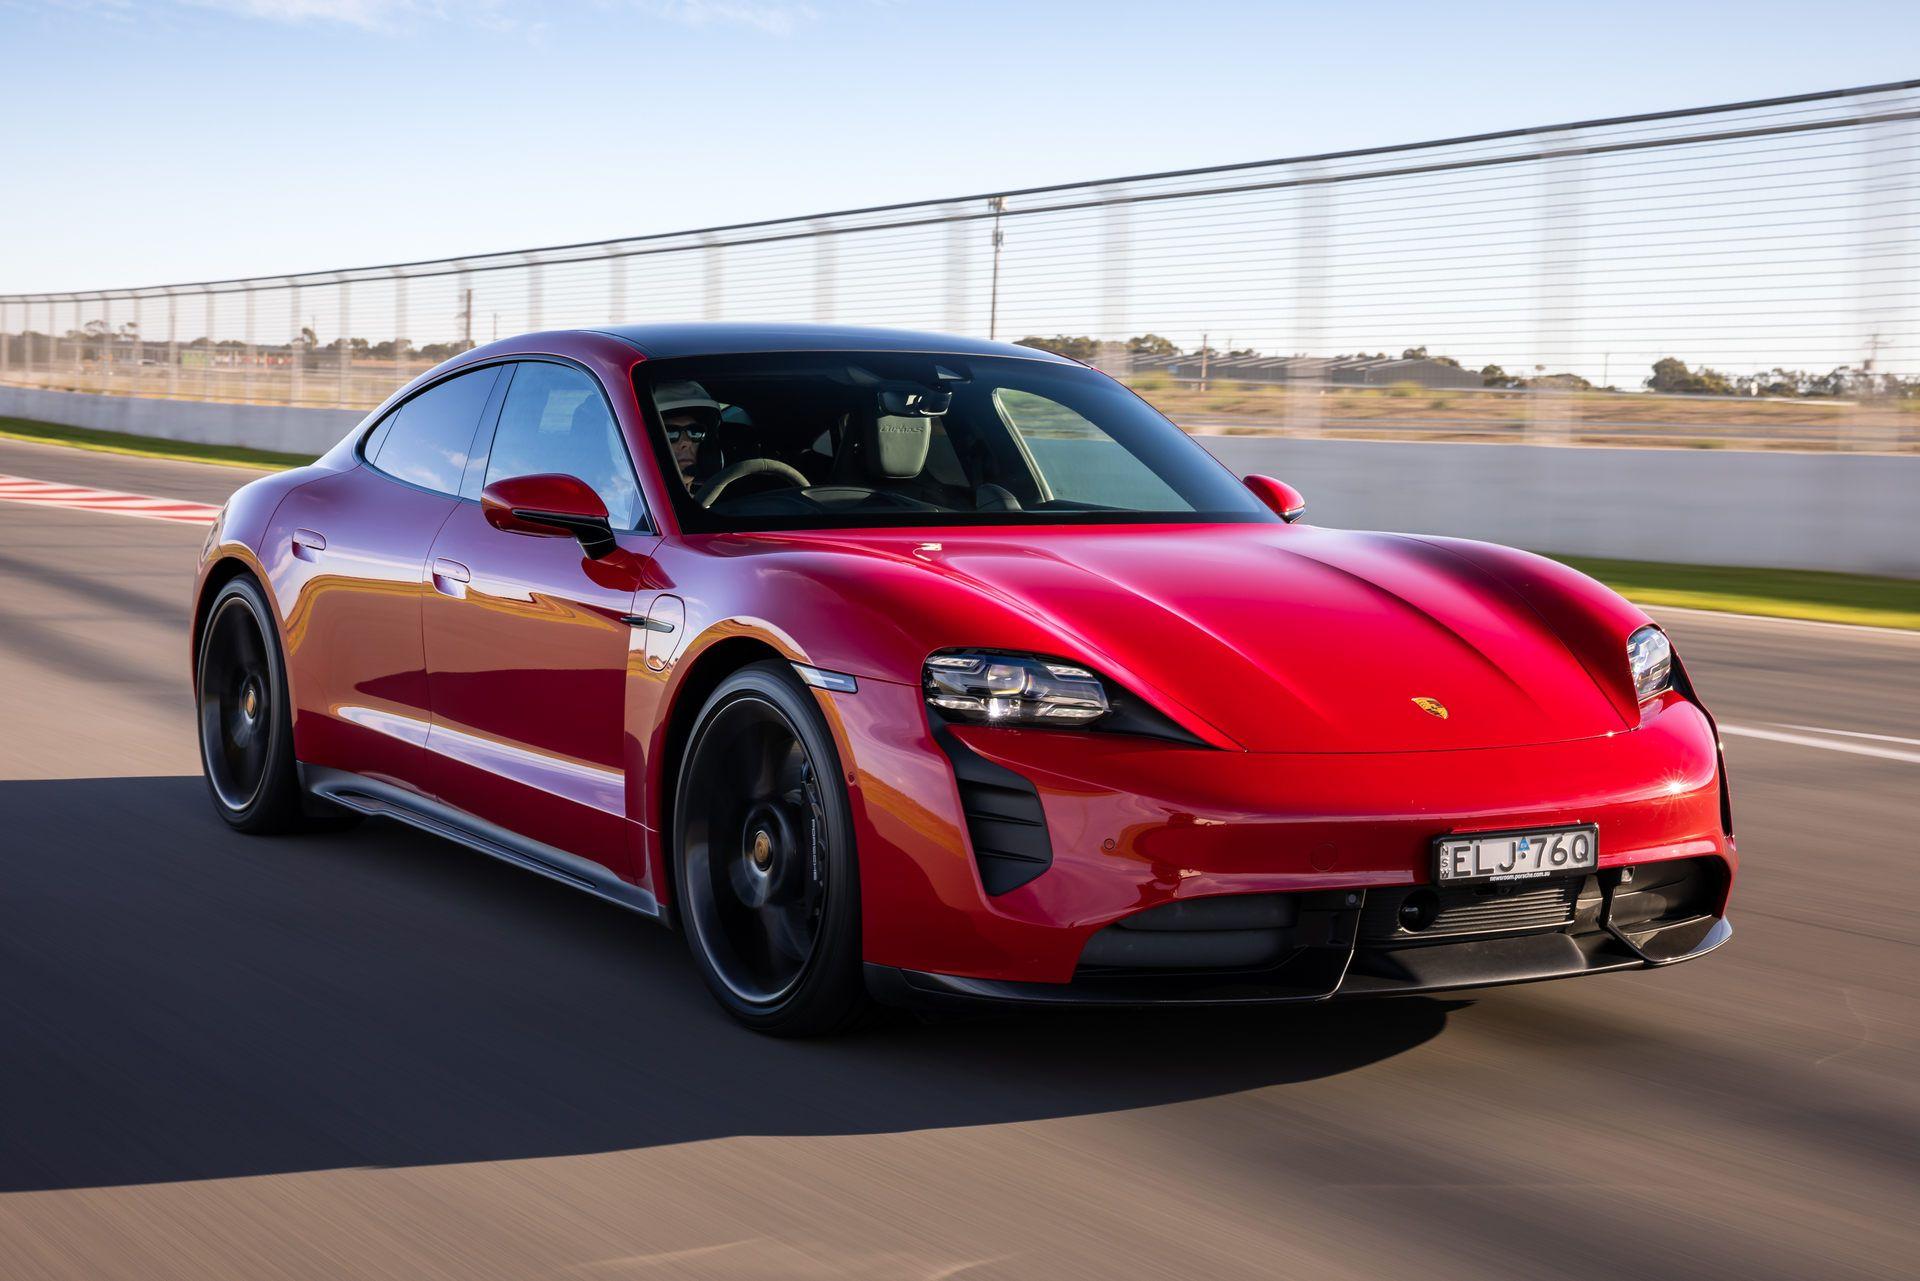 Porsche-Taycan-Turbo-S-The-Bend-Motorsport-Park-24